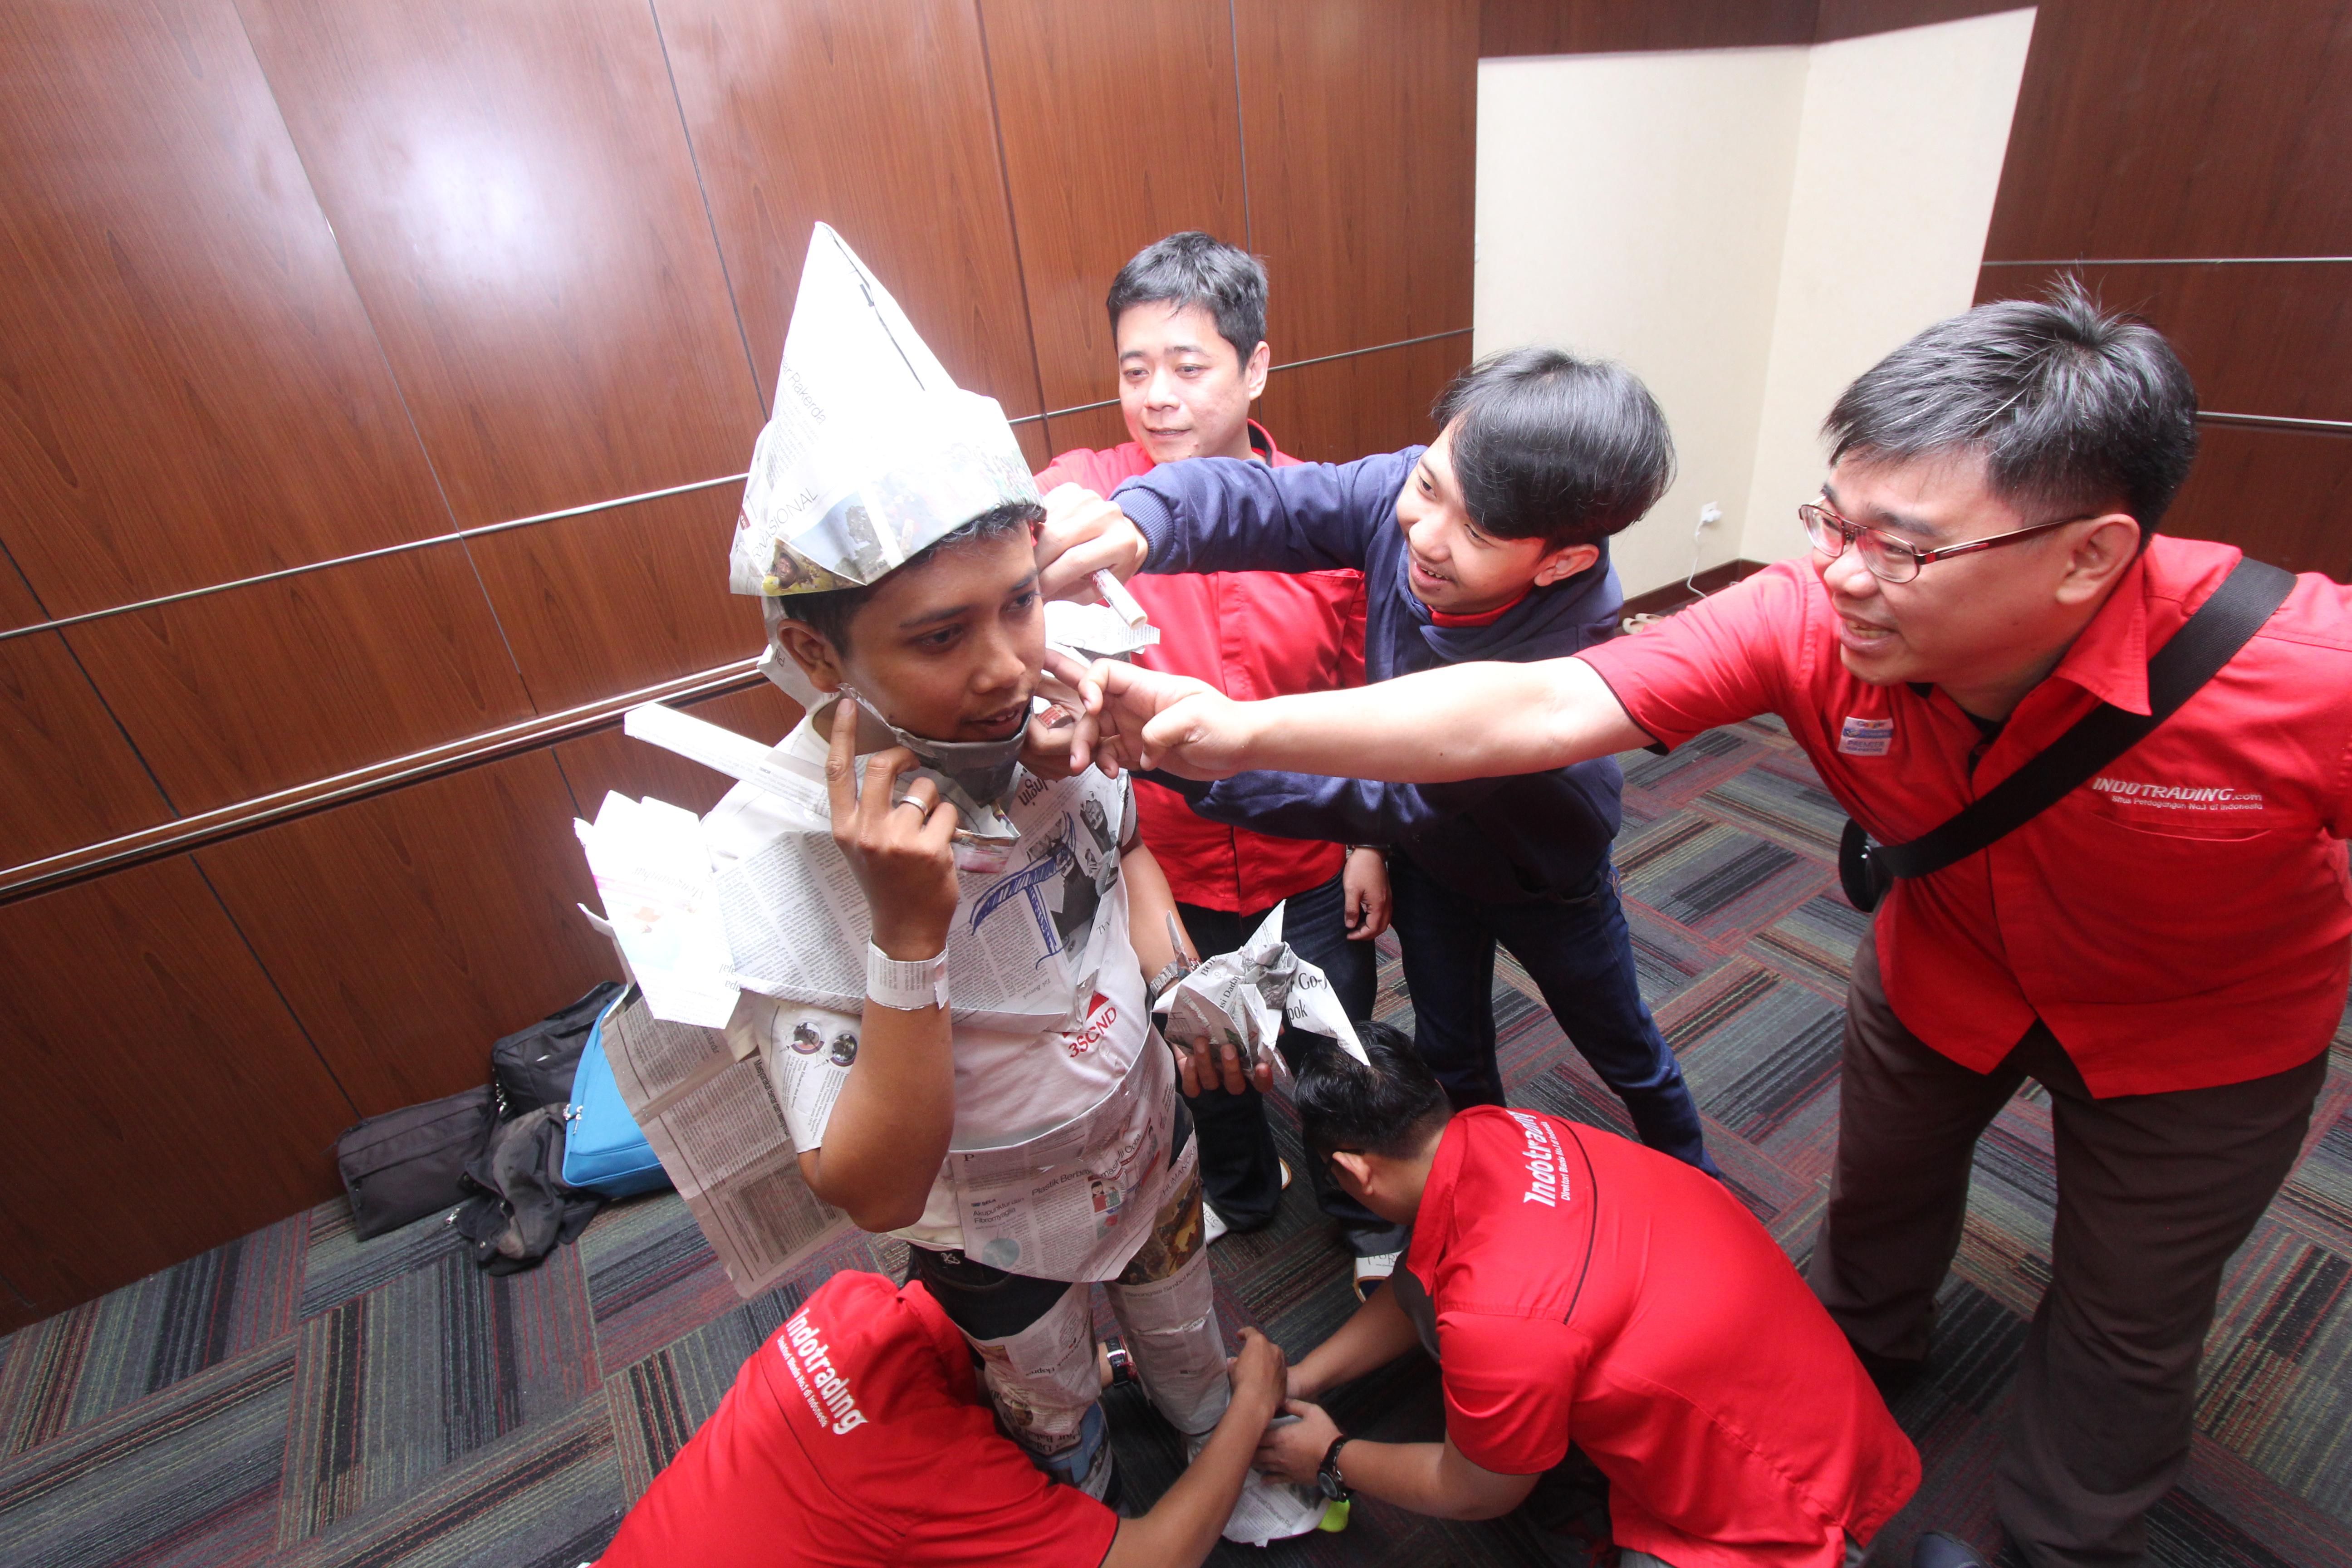 Games mendandani maskot Indotrading seru banget loh! Foto: Indotrading